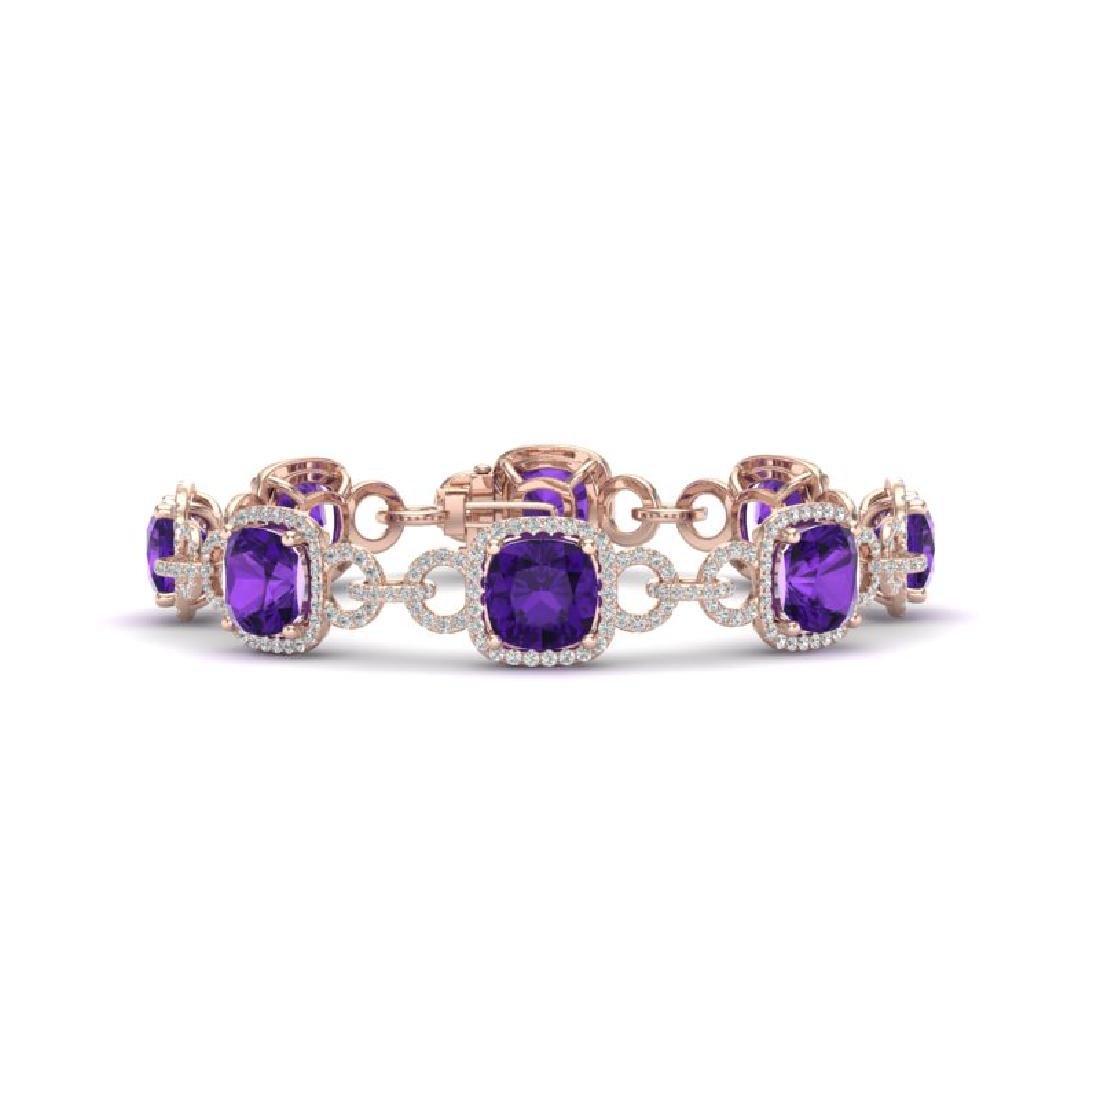 30 CTW Amethyst & VS/SI Diamond Bracelet 14K Rose Gold